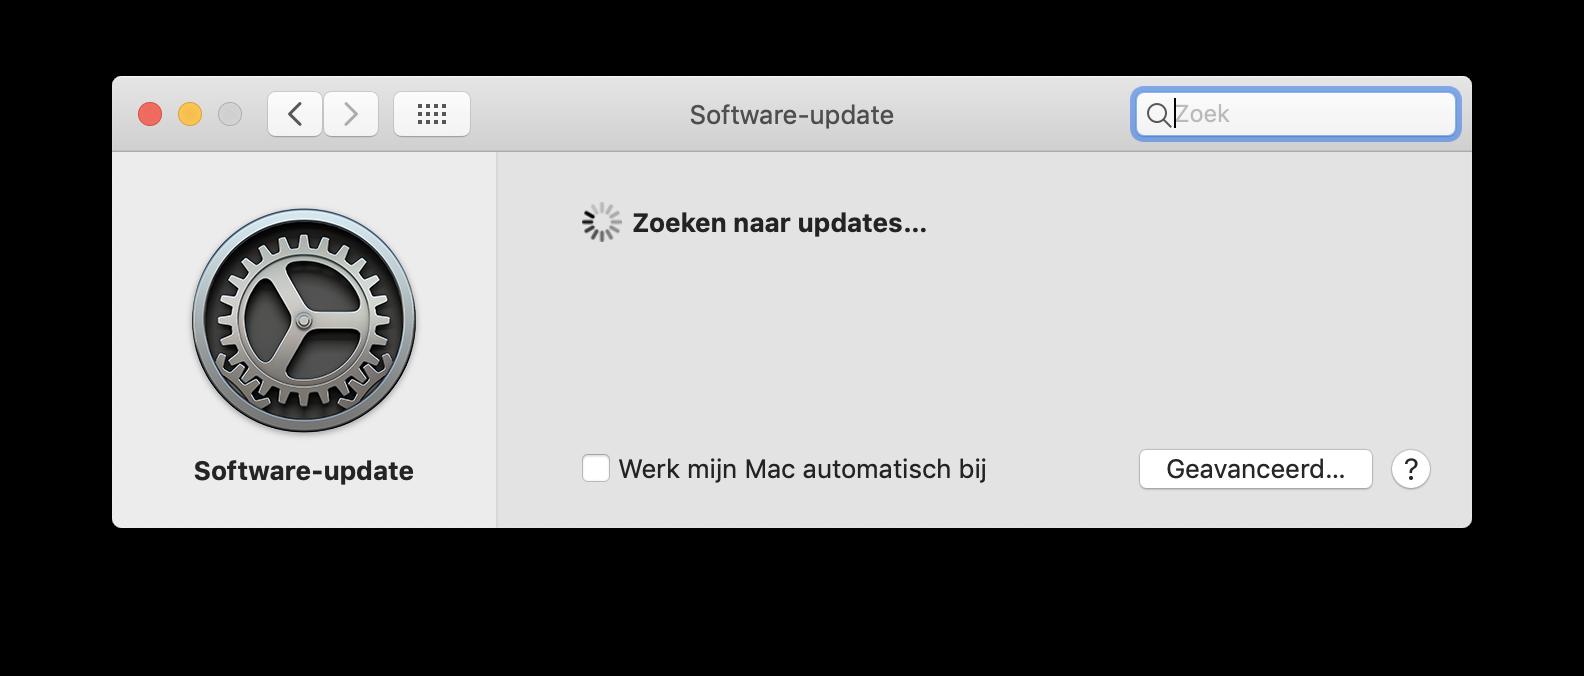 https://www.macfreak.nl/modules/news/images/zArt.MojaveSoftwareUpdate.png